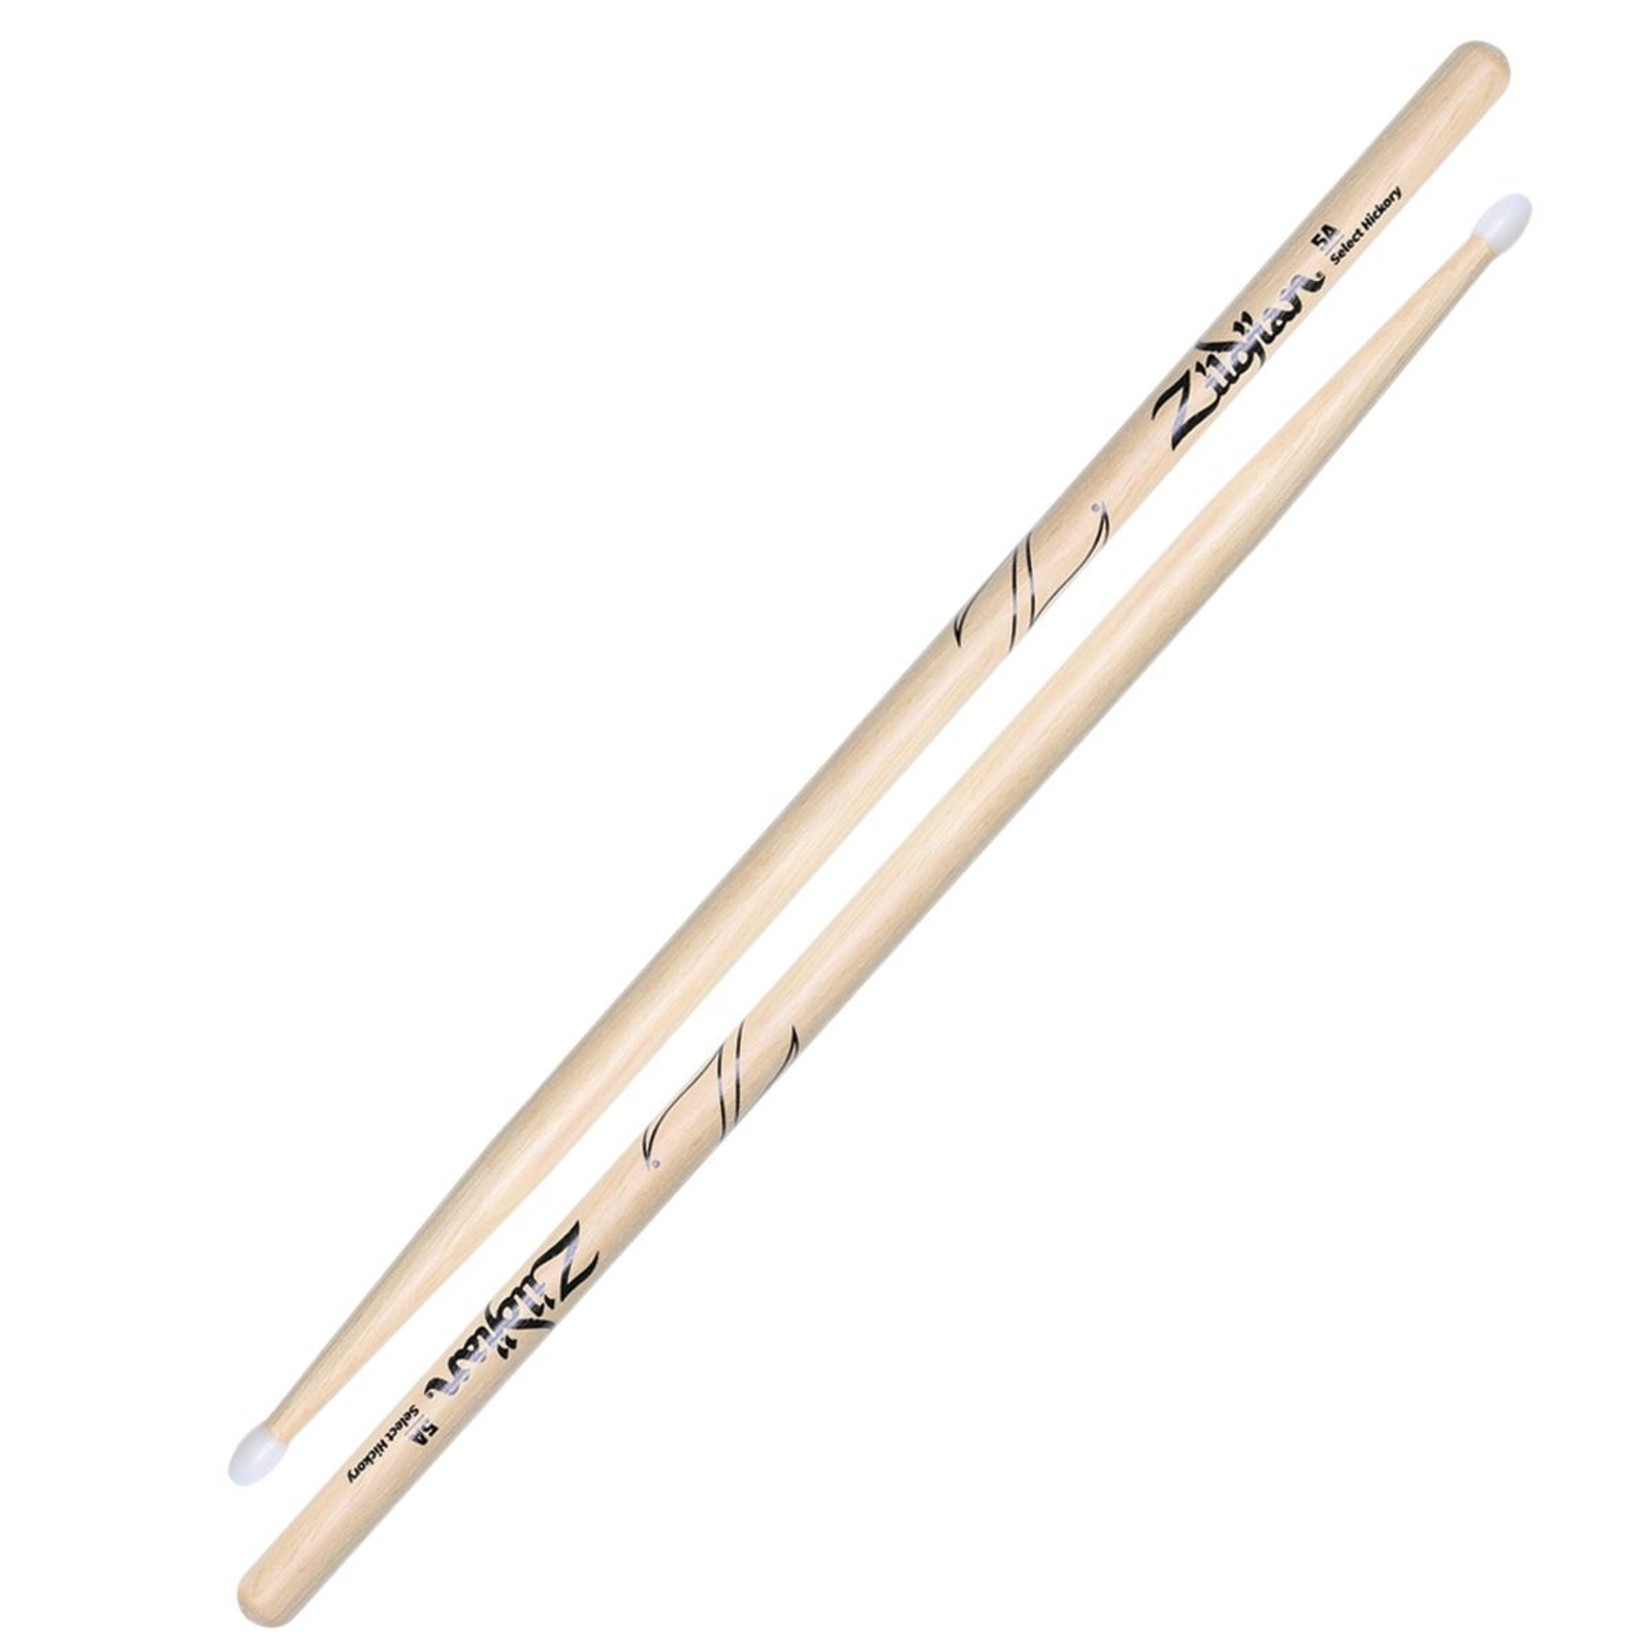 Zildjian Zildjian 5A Nylon Drumsticks